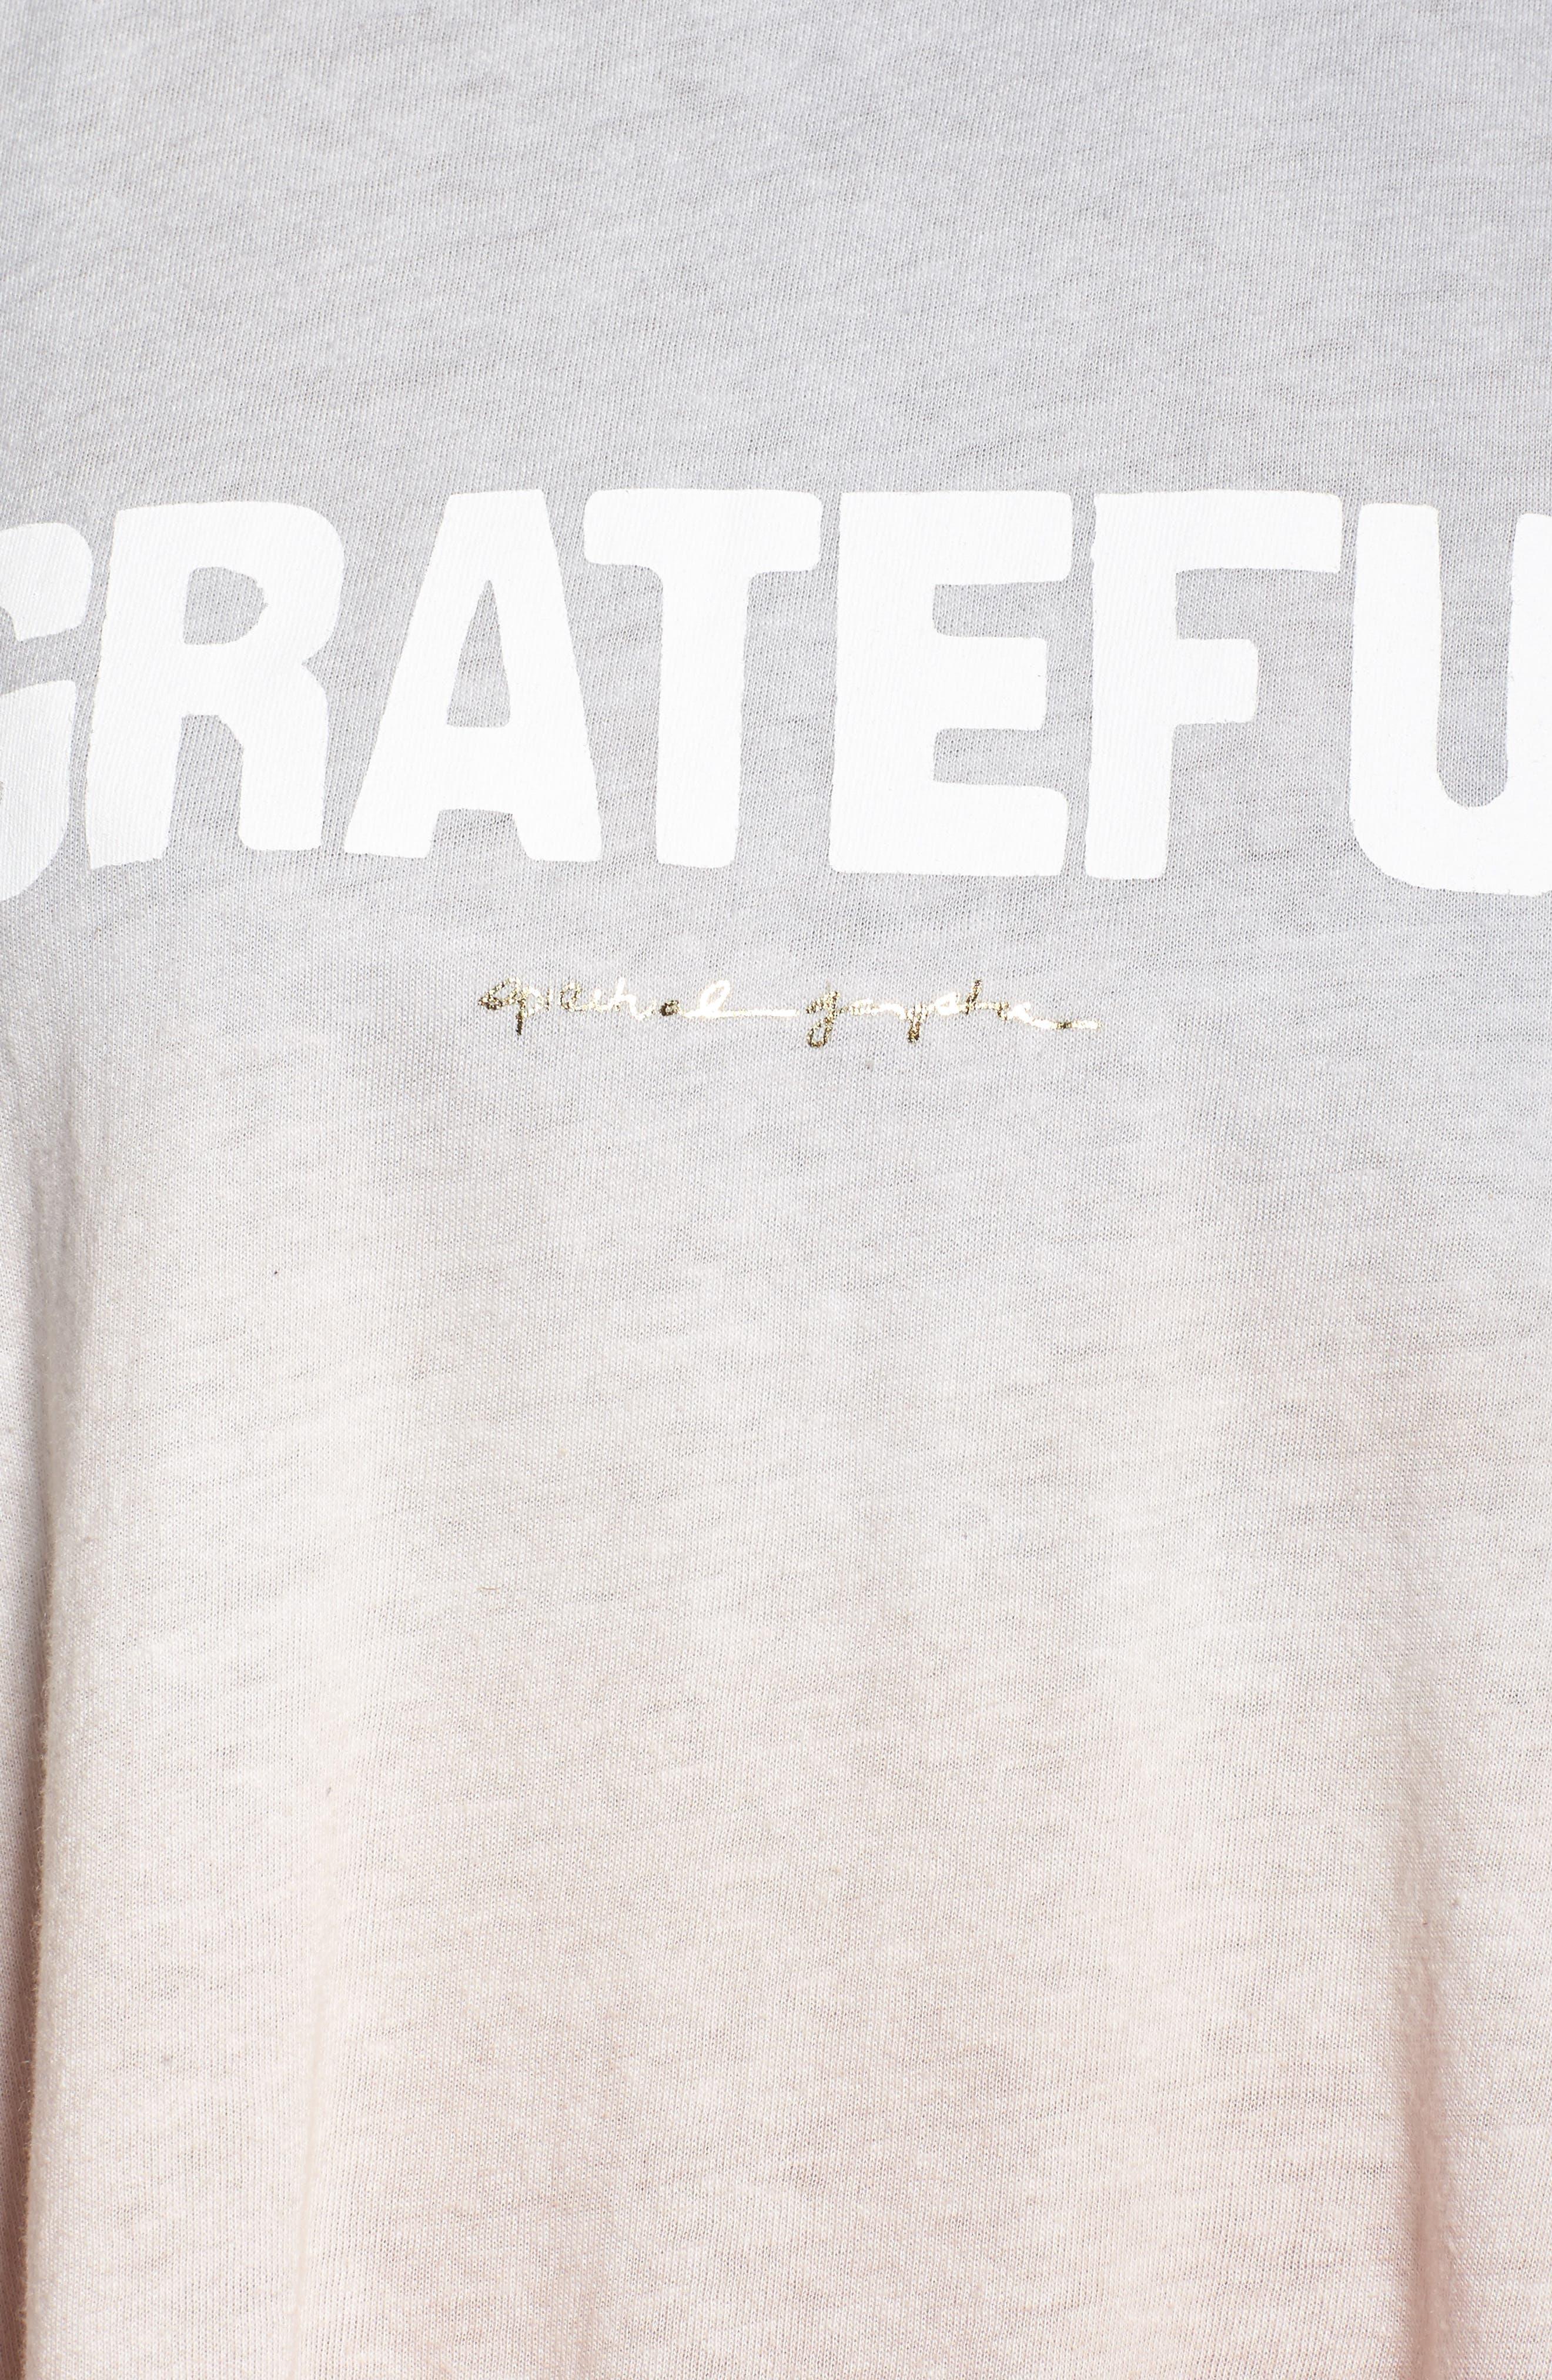 Grateful Graphic Tank,                             Alternate thumbnail 6, color,                             Sunset